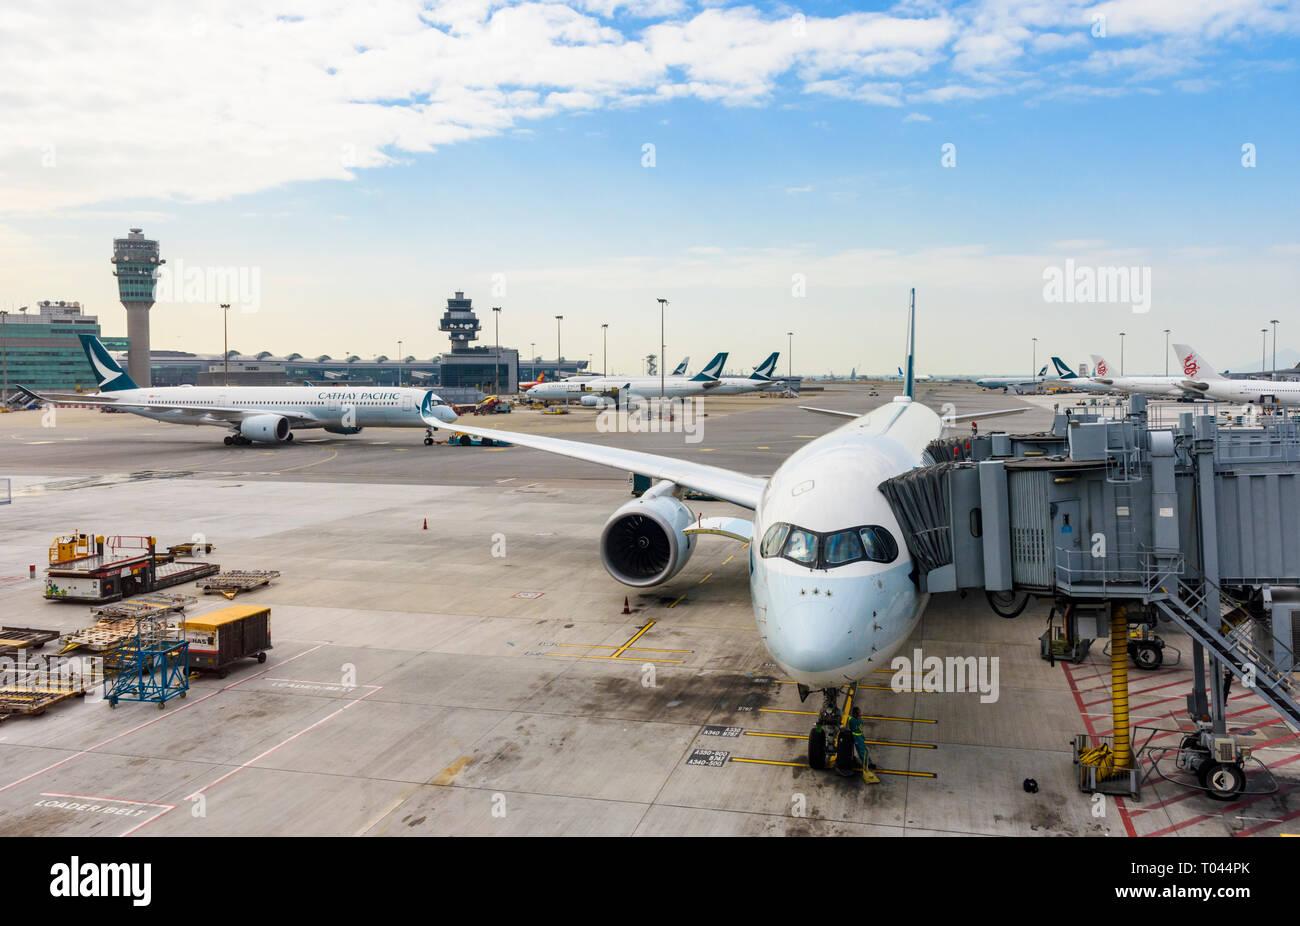 Hong Kong International Airport, Chek Lap Kok, Hong Kong - Stock Image